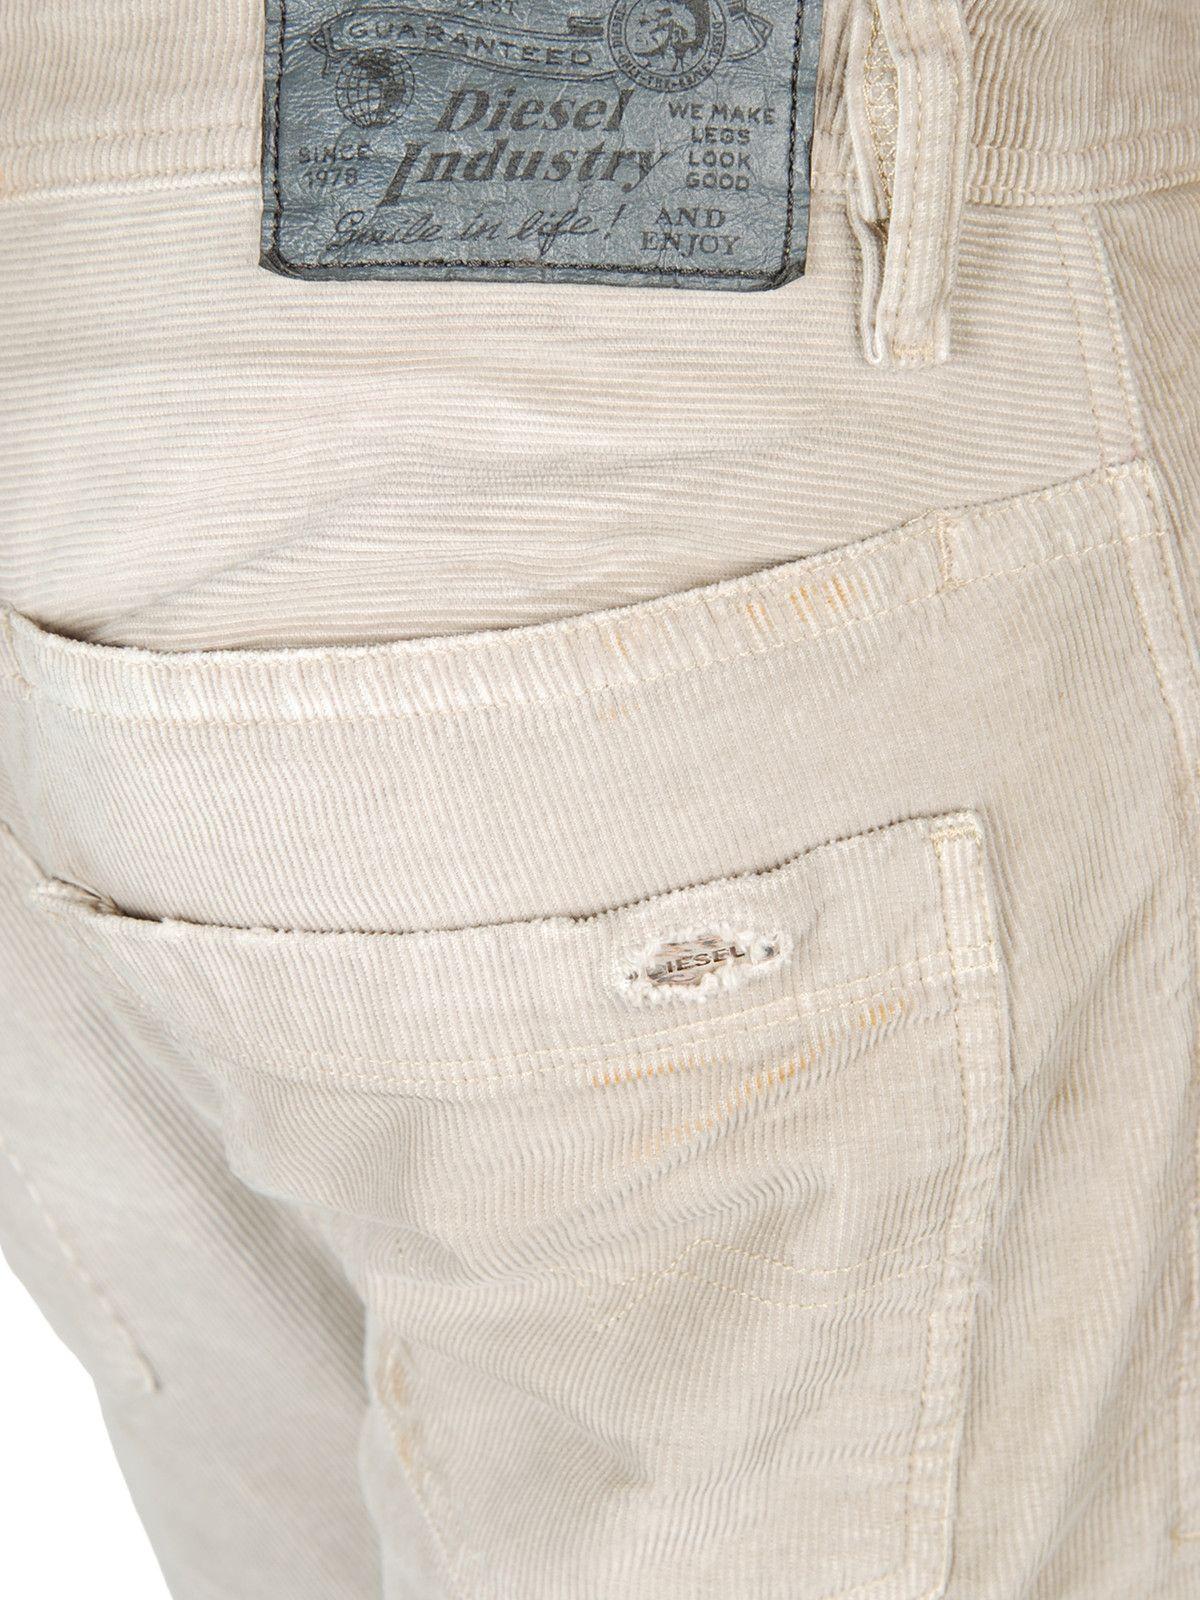 Diesel Braddom-A 003J1 Jeans